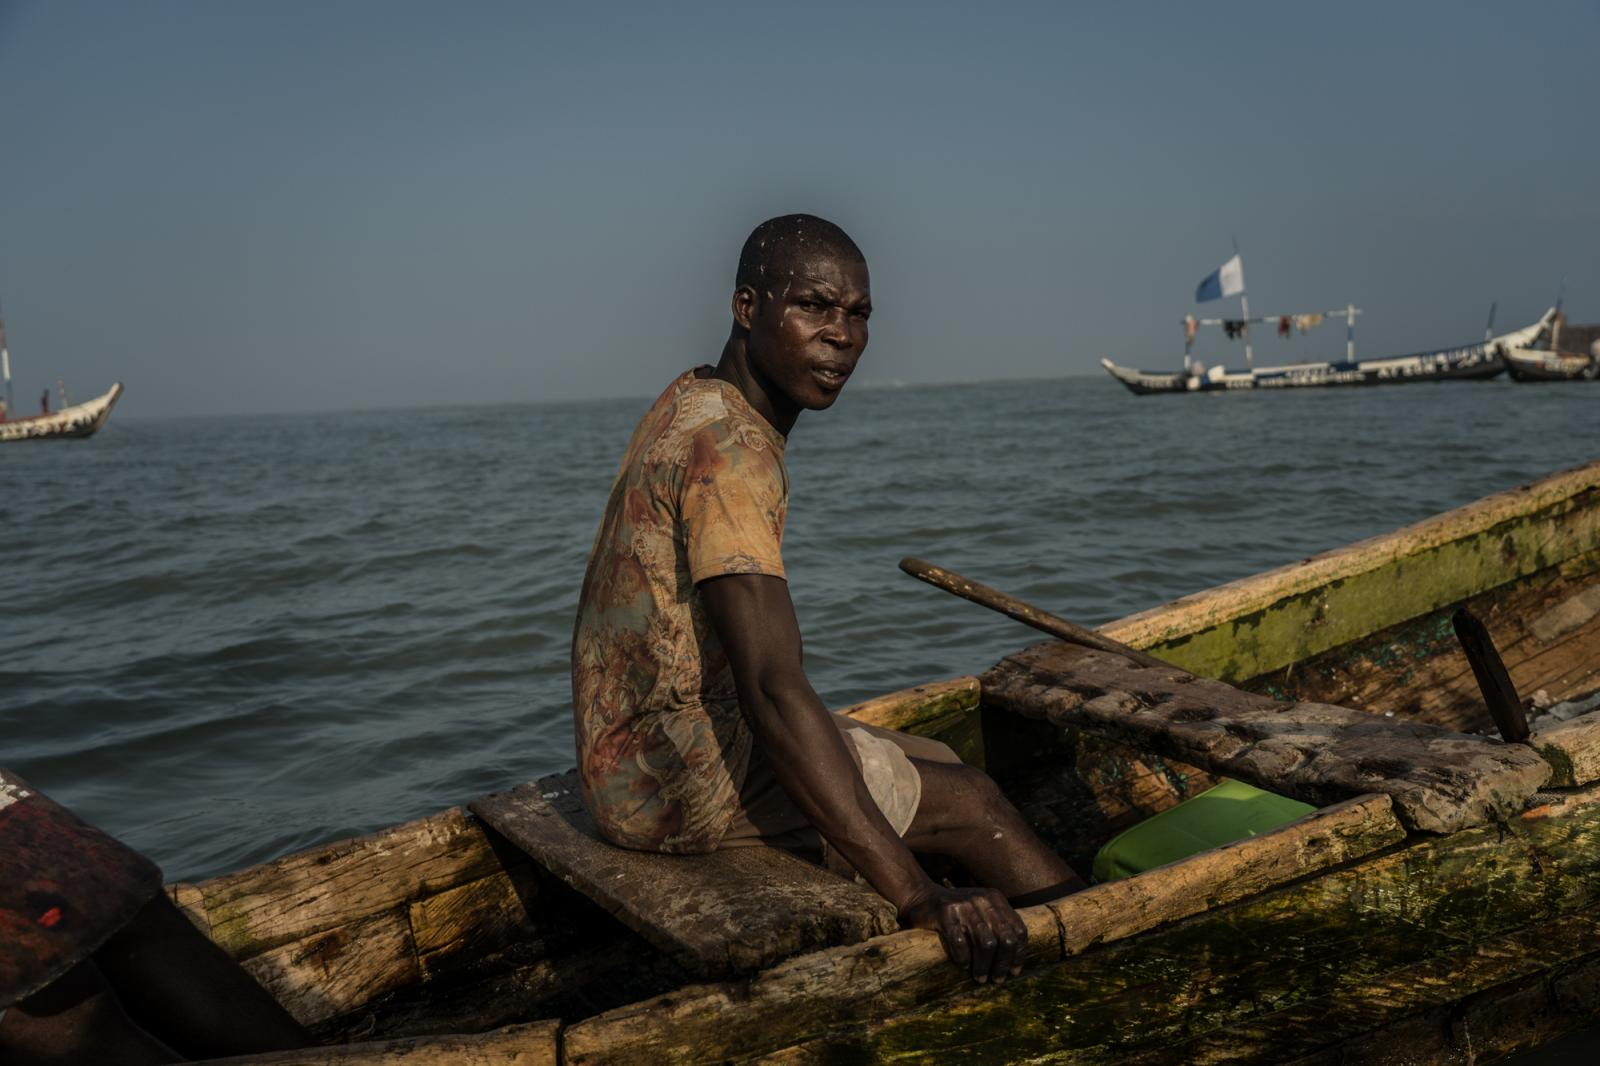 Photography image - Loading Jamestown_Fishing_(7_of_15).jpg